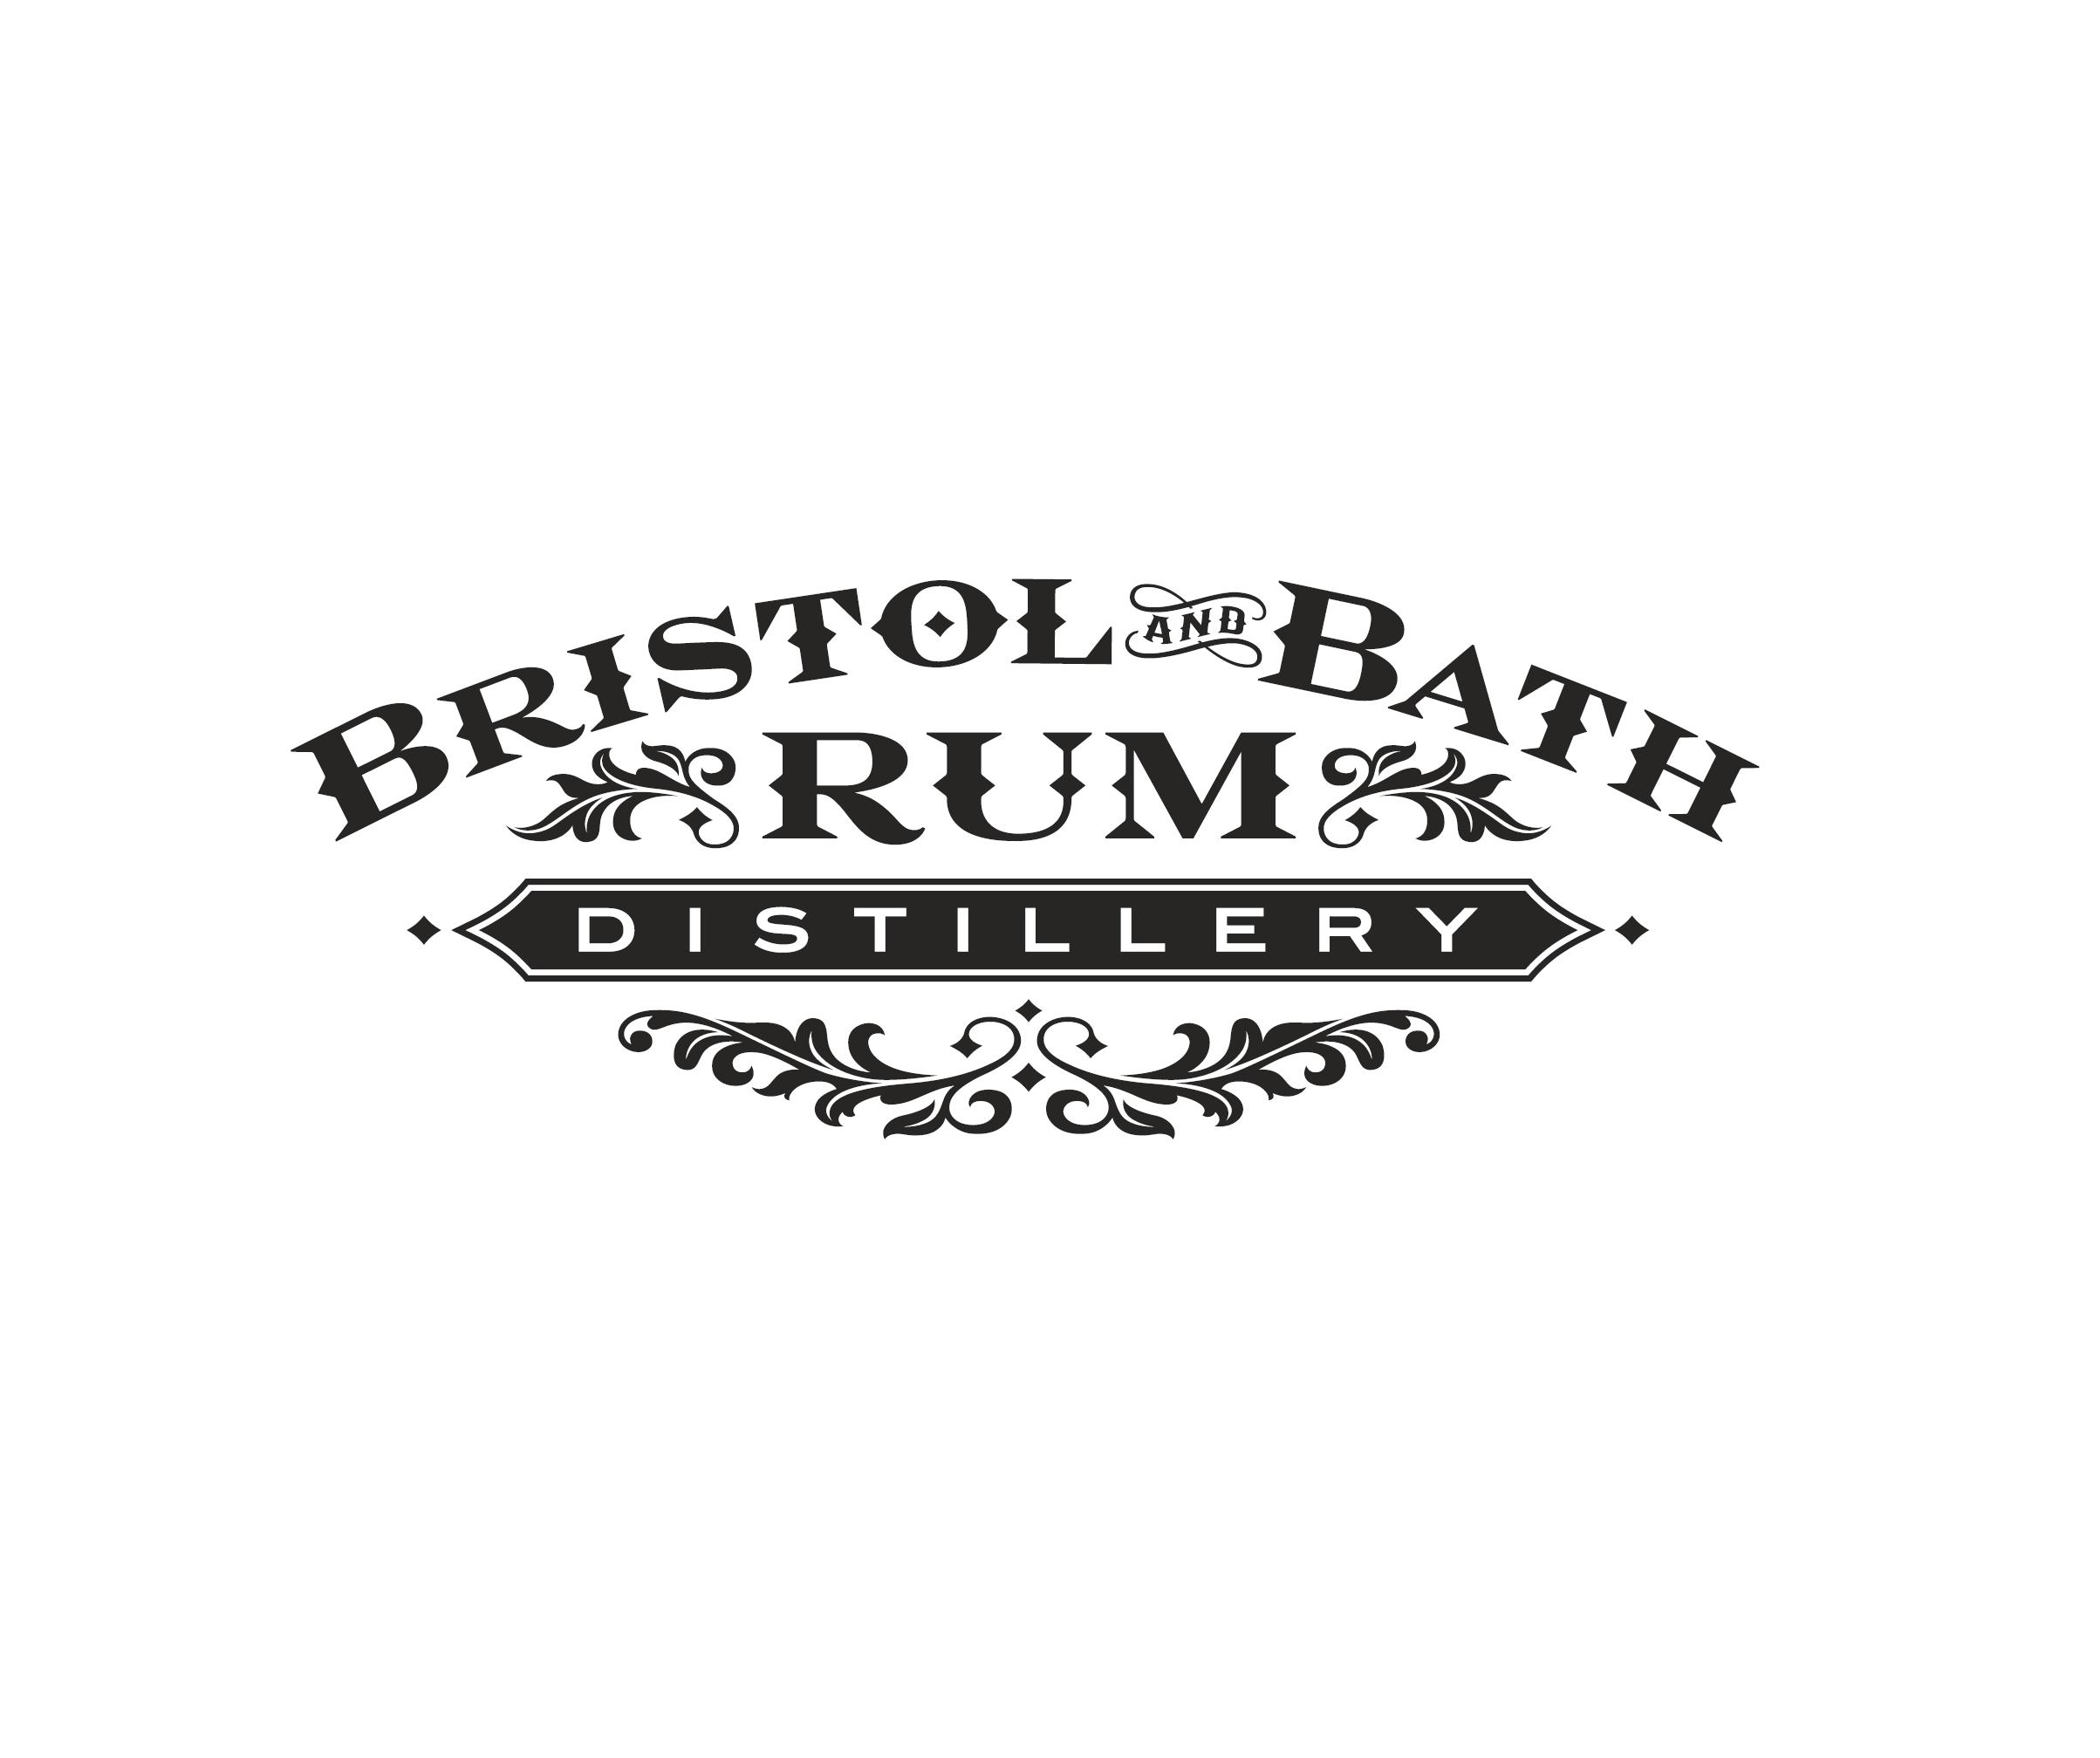 Bristol & Bath Rum Distillery